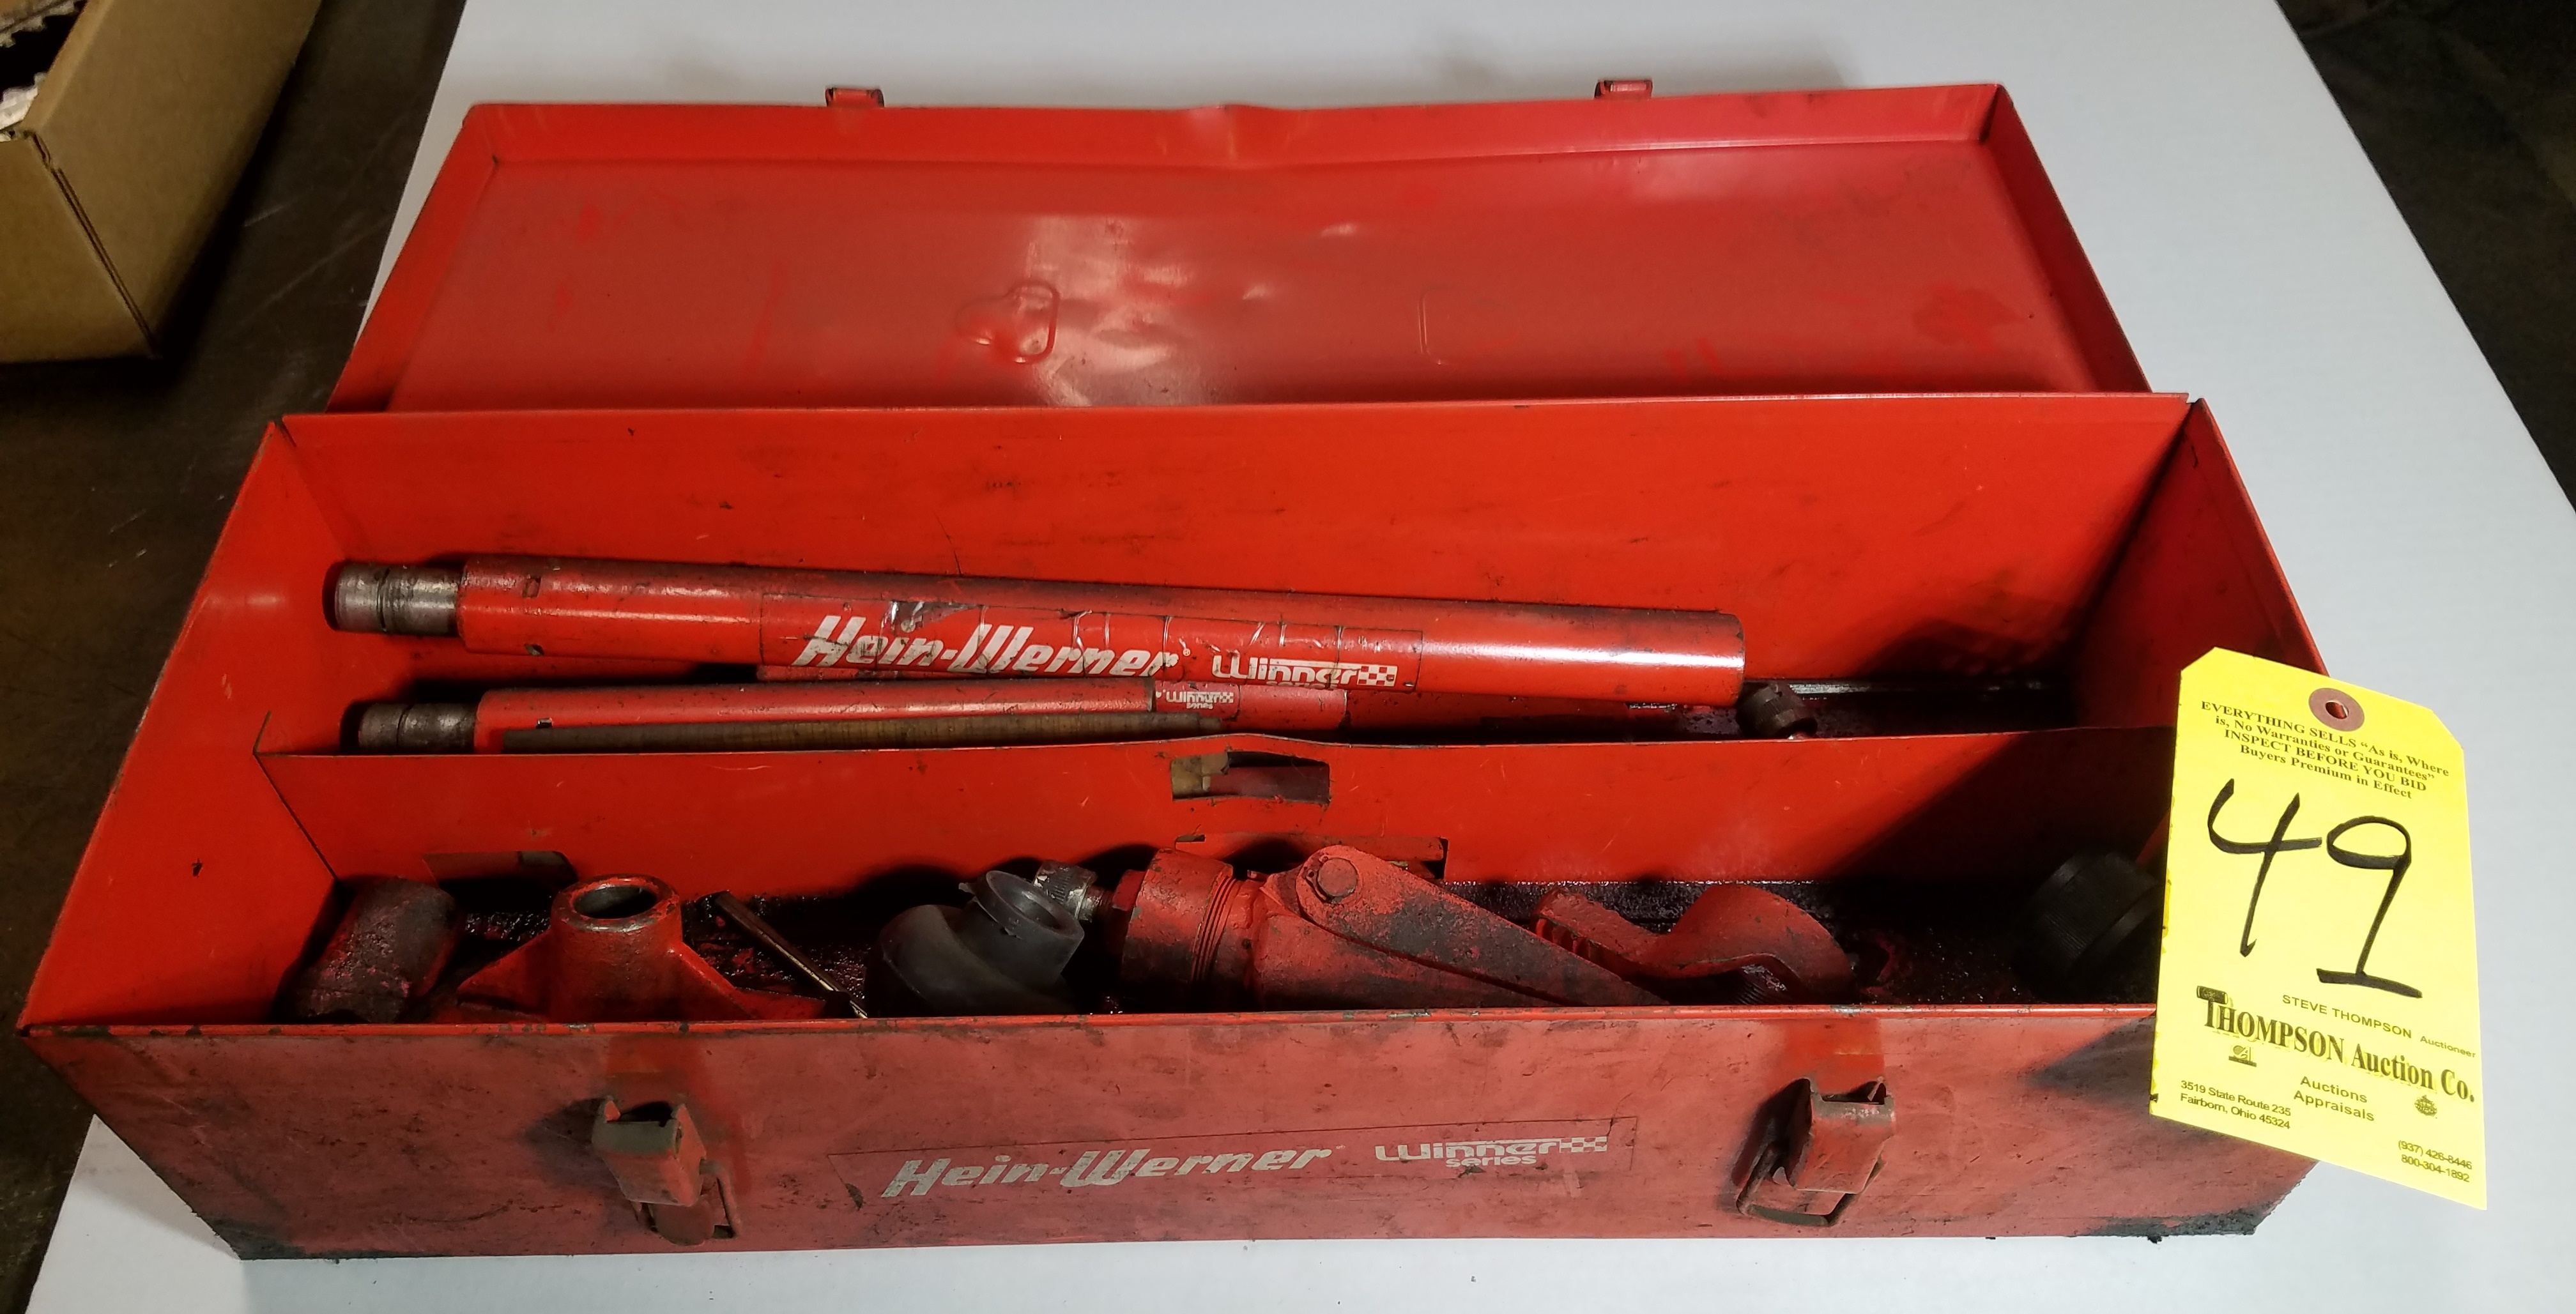 Hein Werner Porta A Power Set, No Hyd. Power Supply